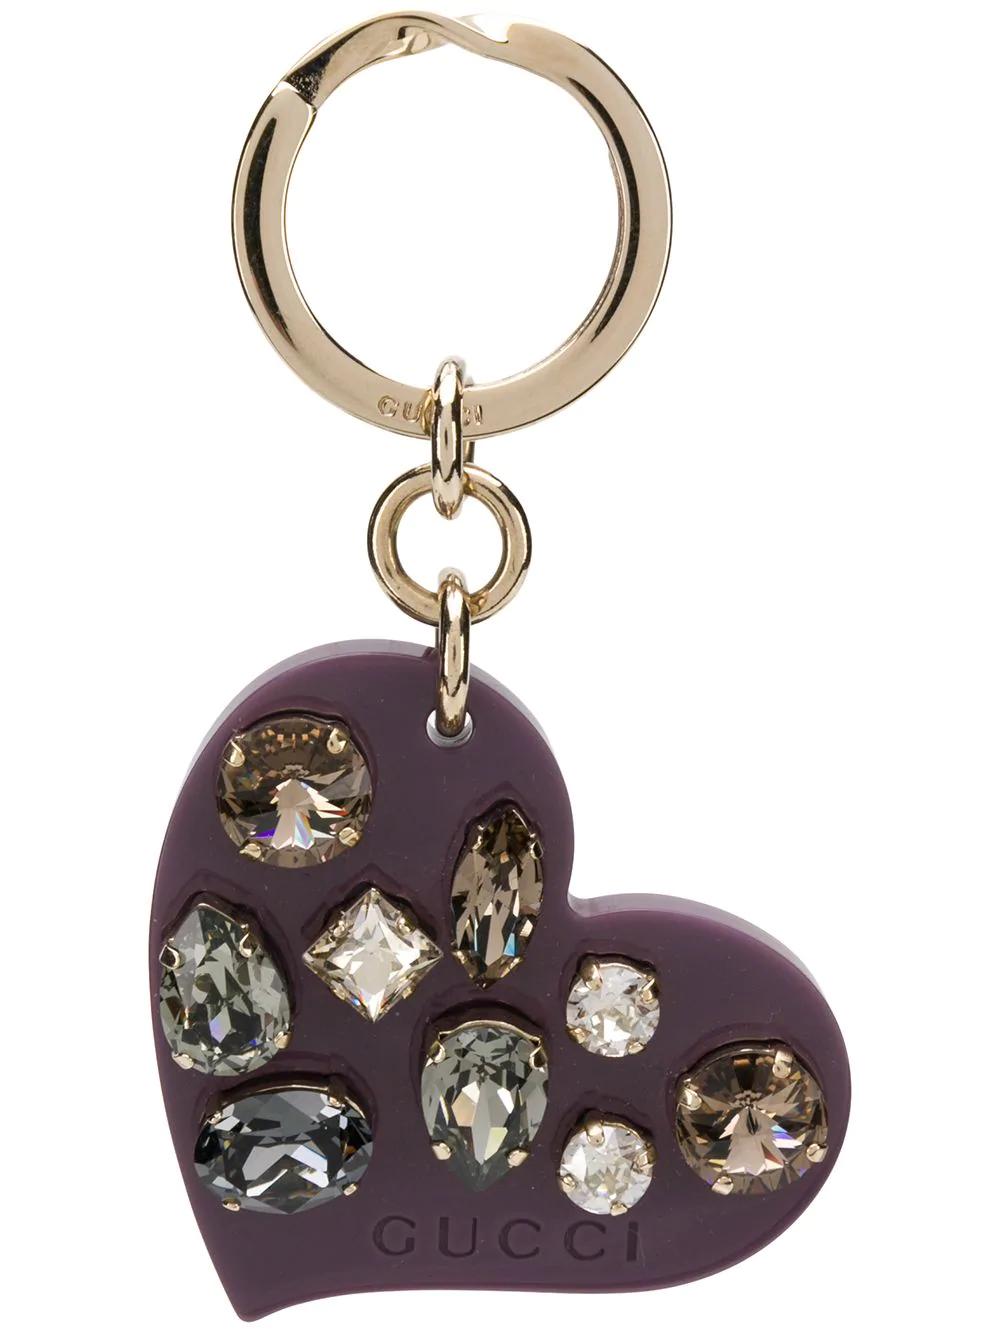 62988c09a28 Gucci Embellished Heart Keyring - Purple